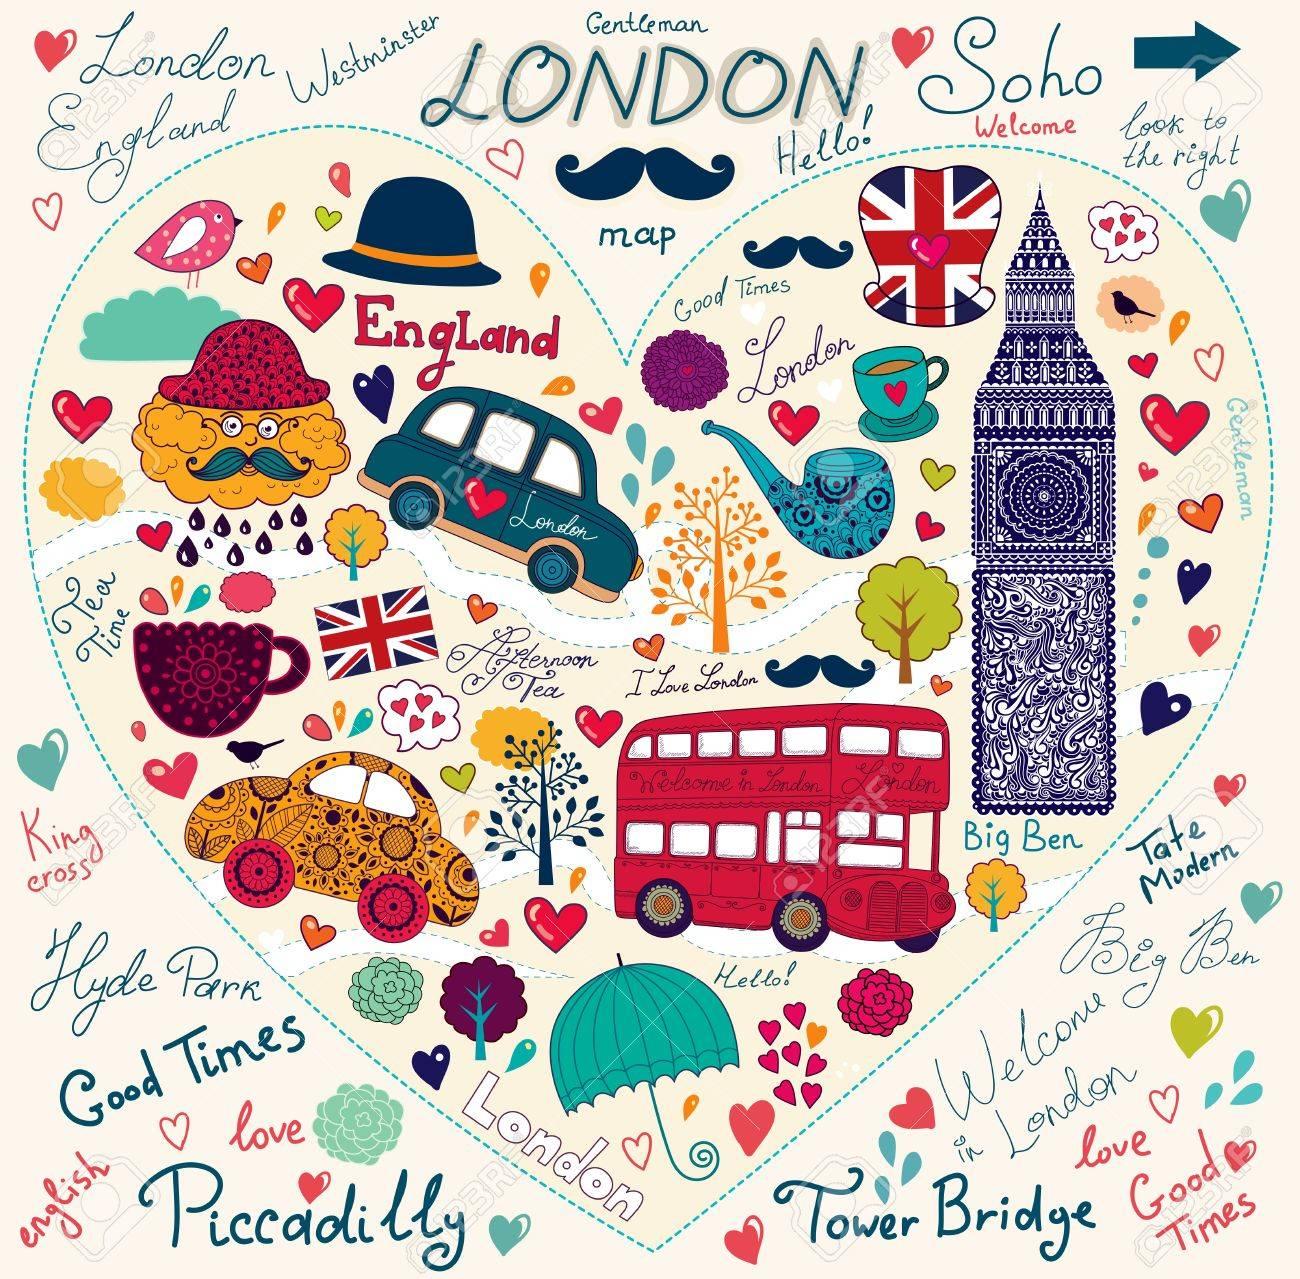 http://previews.123rf.com/images/moleskostudio/moleskostudio1209/moleskostudio120900118/15381879-Vector-set-of-London-symbols-and-landmarks-Stock-Vector-london-england-flag.jpg